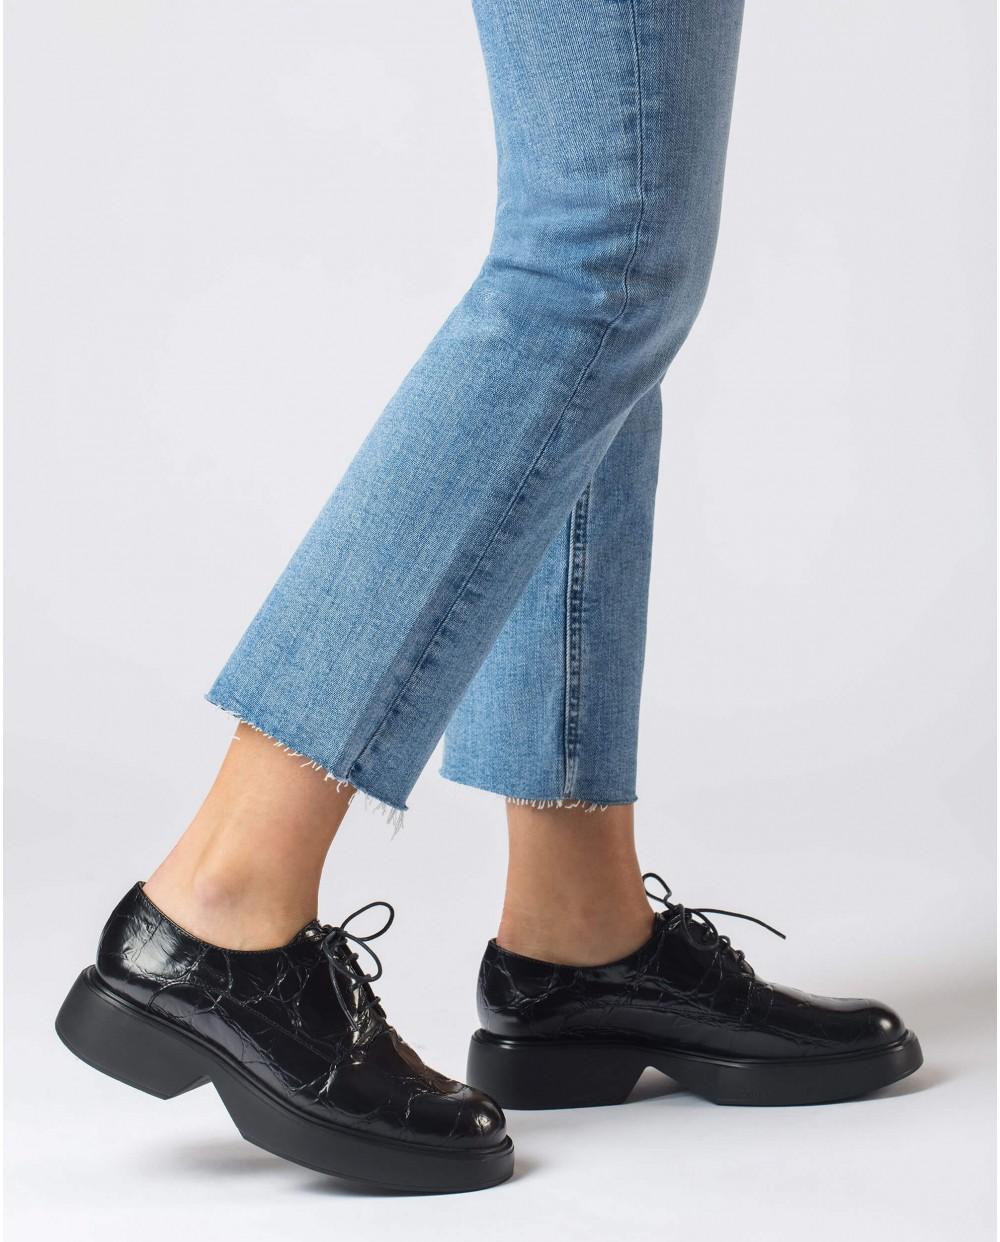 Wonders-Flat Shoes-Black Sonic Blucher